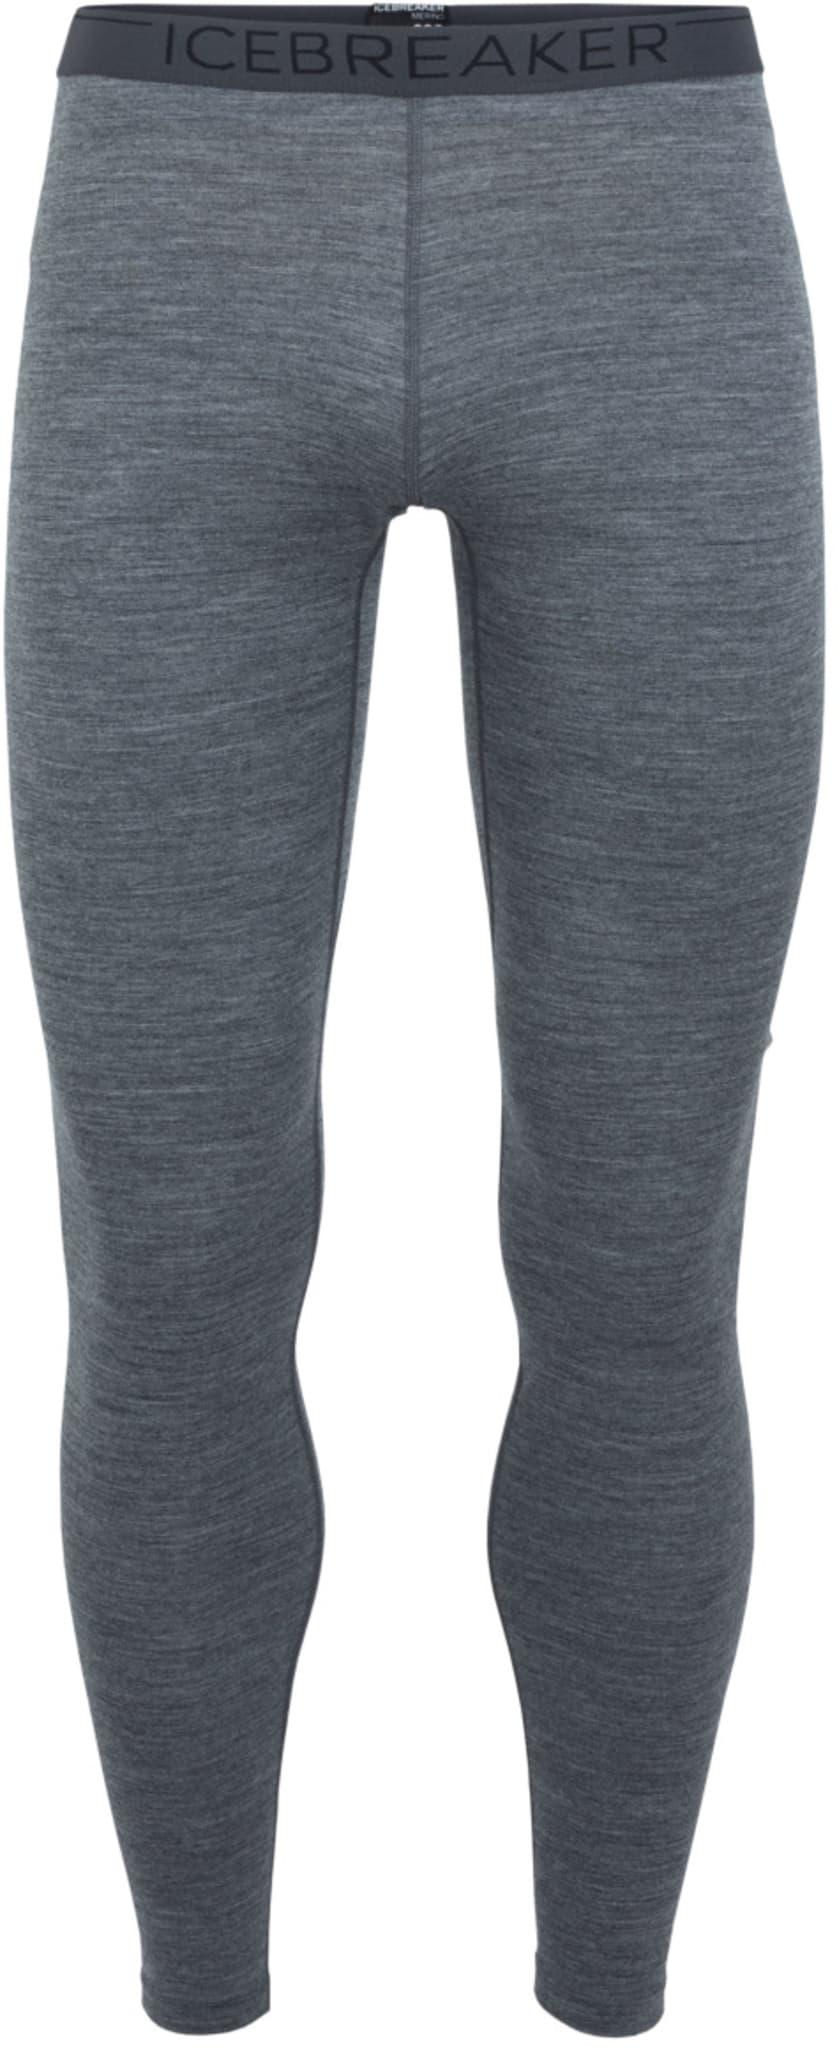 200 Oasis Leggings Ms